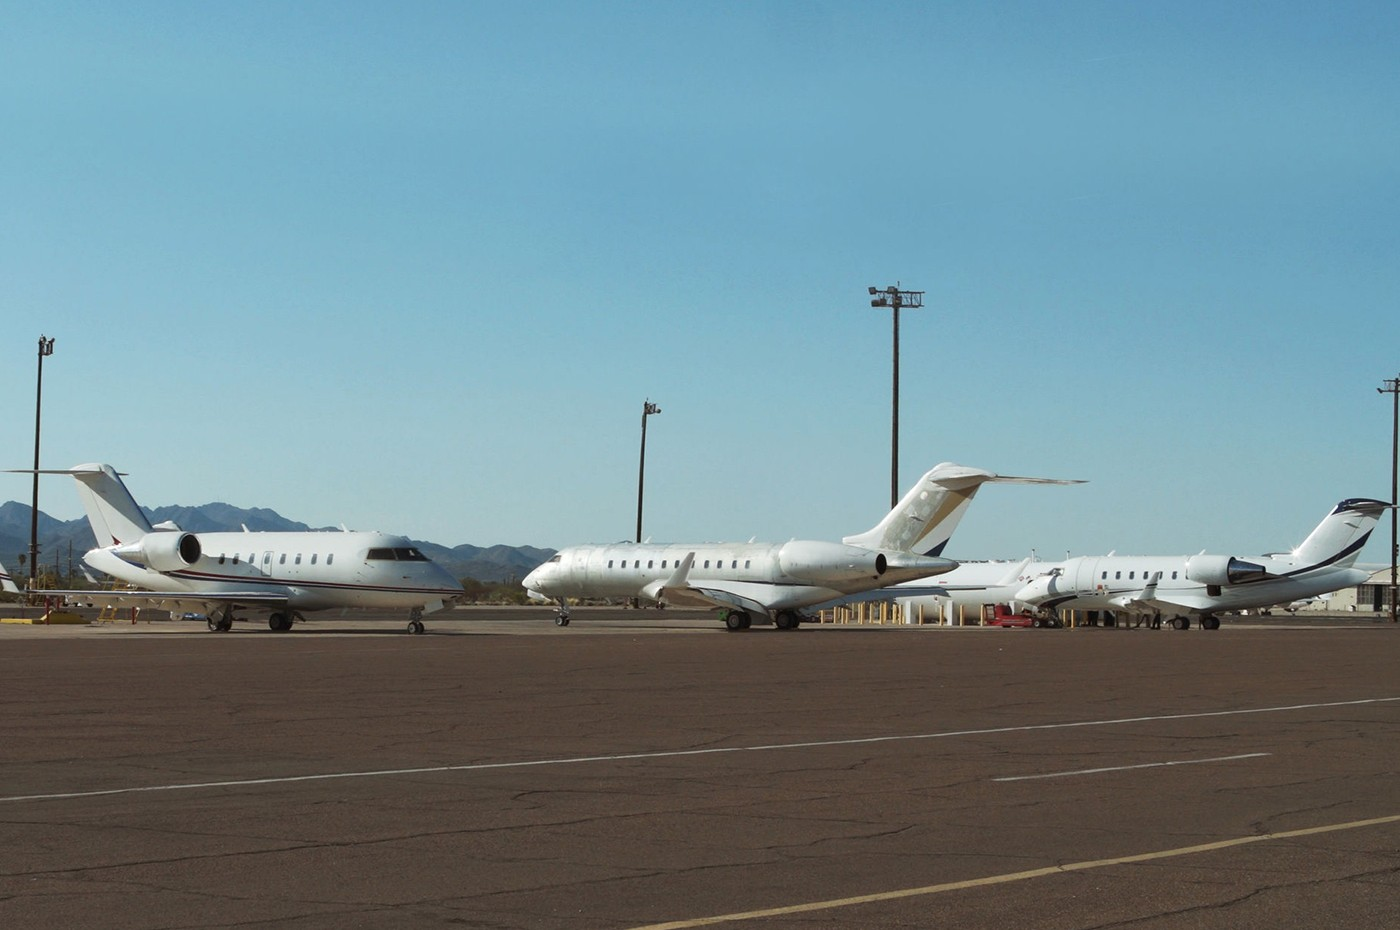 Tucson Service Centre - Tarmac